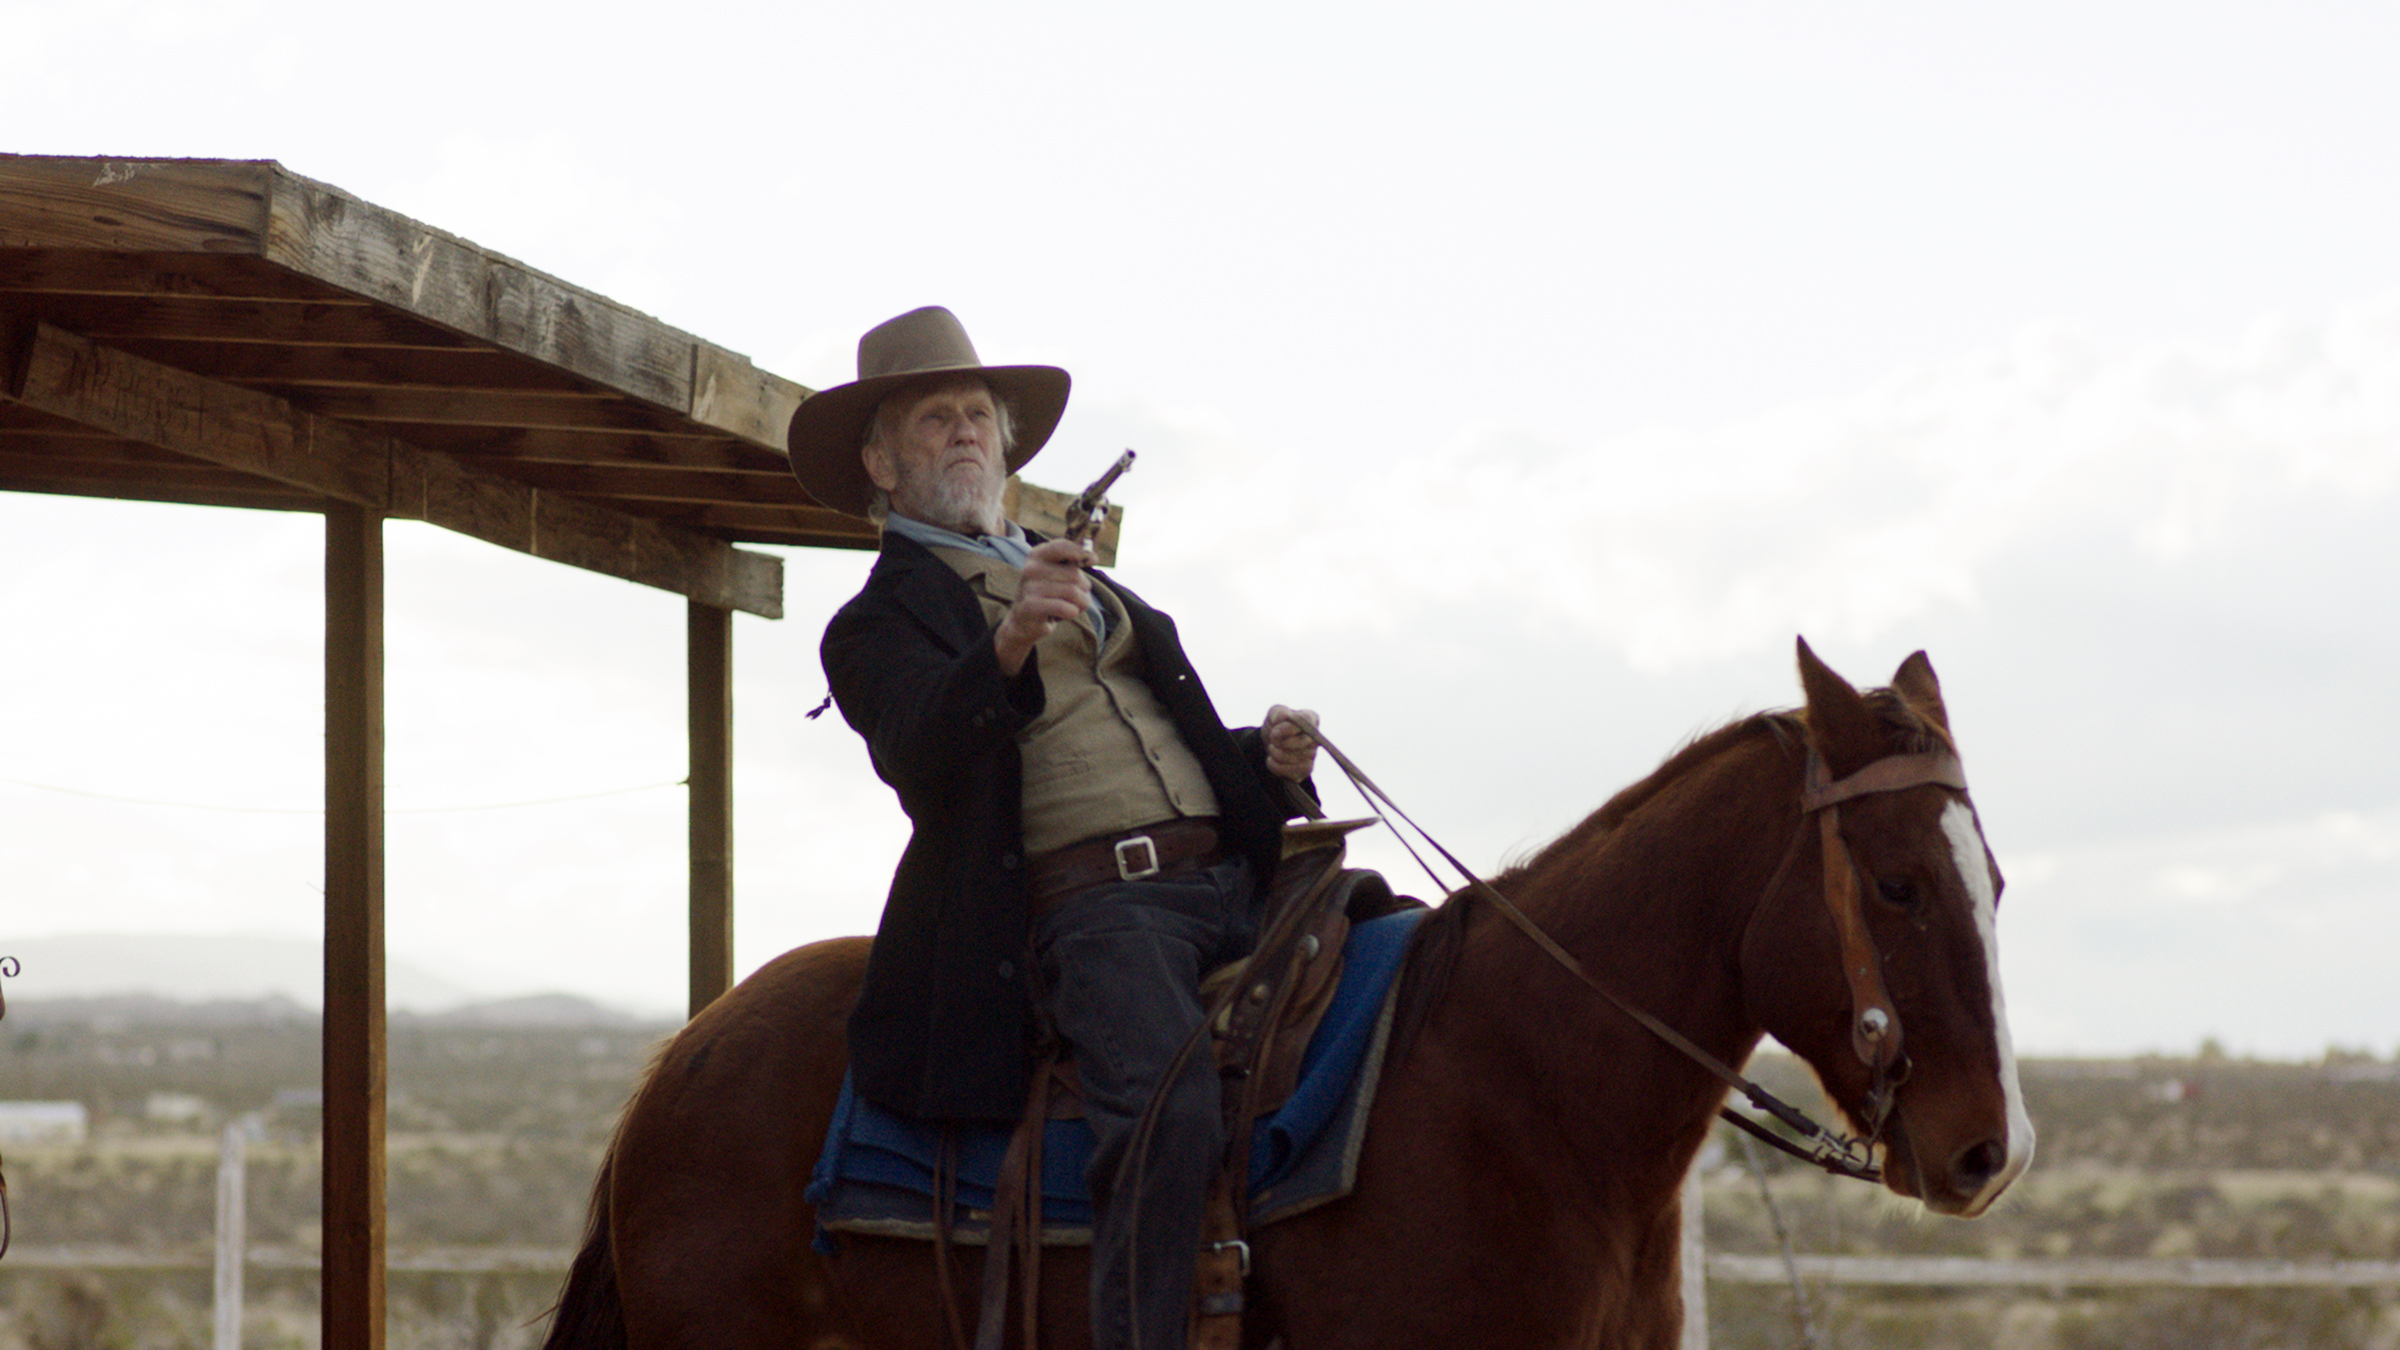 Kris on Horse1